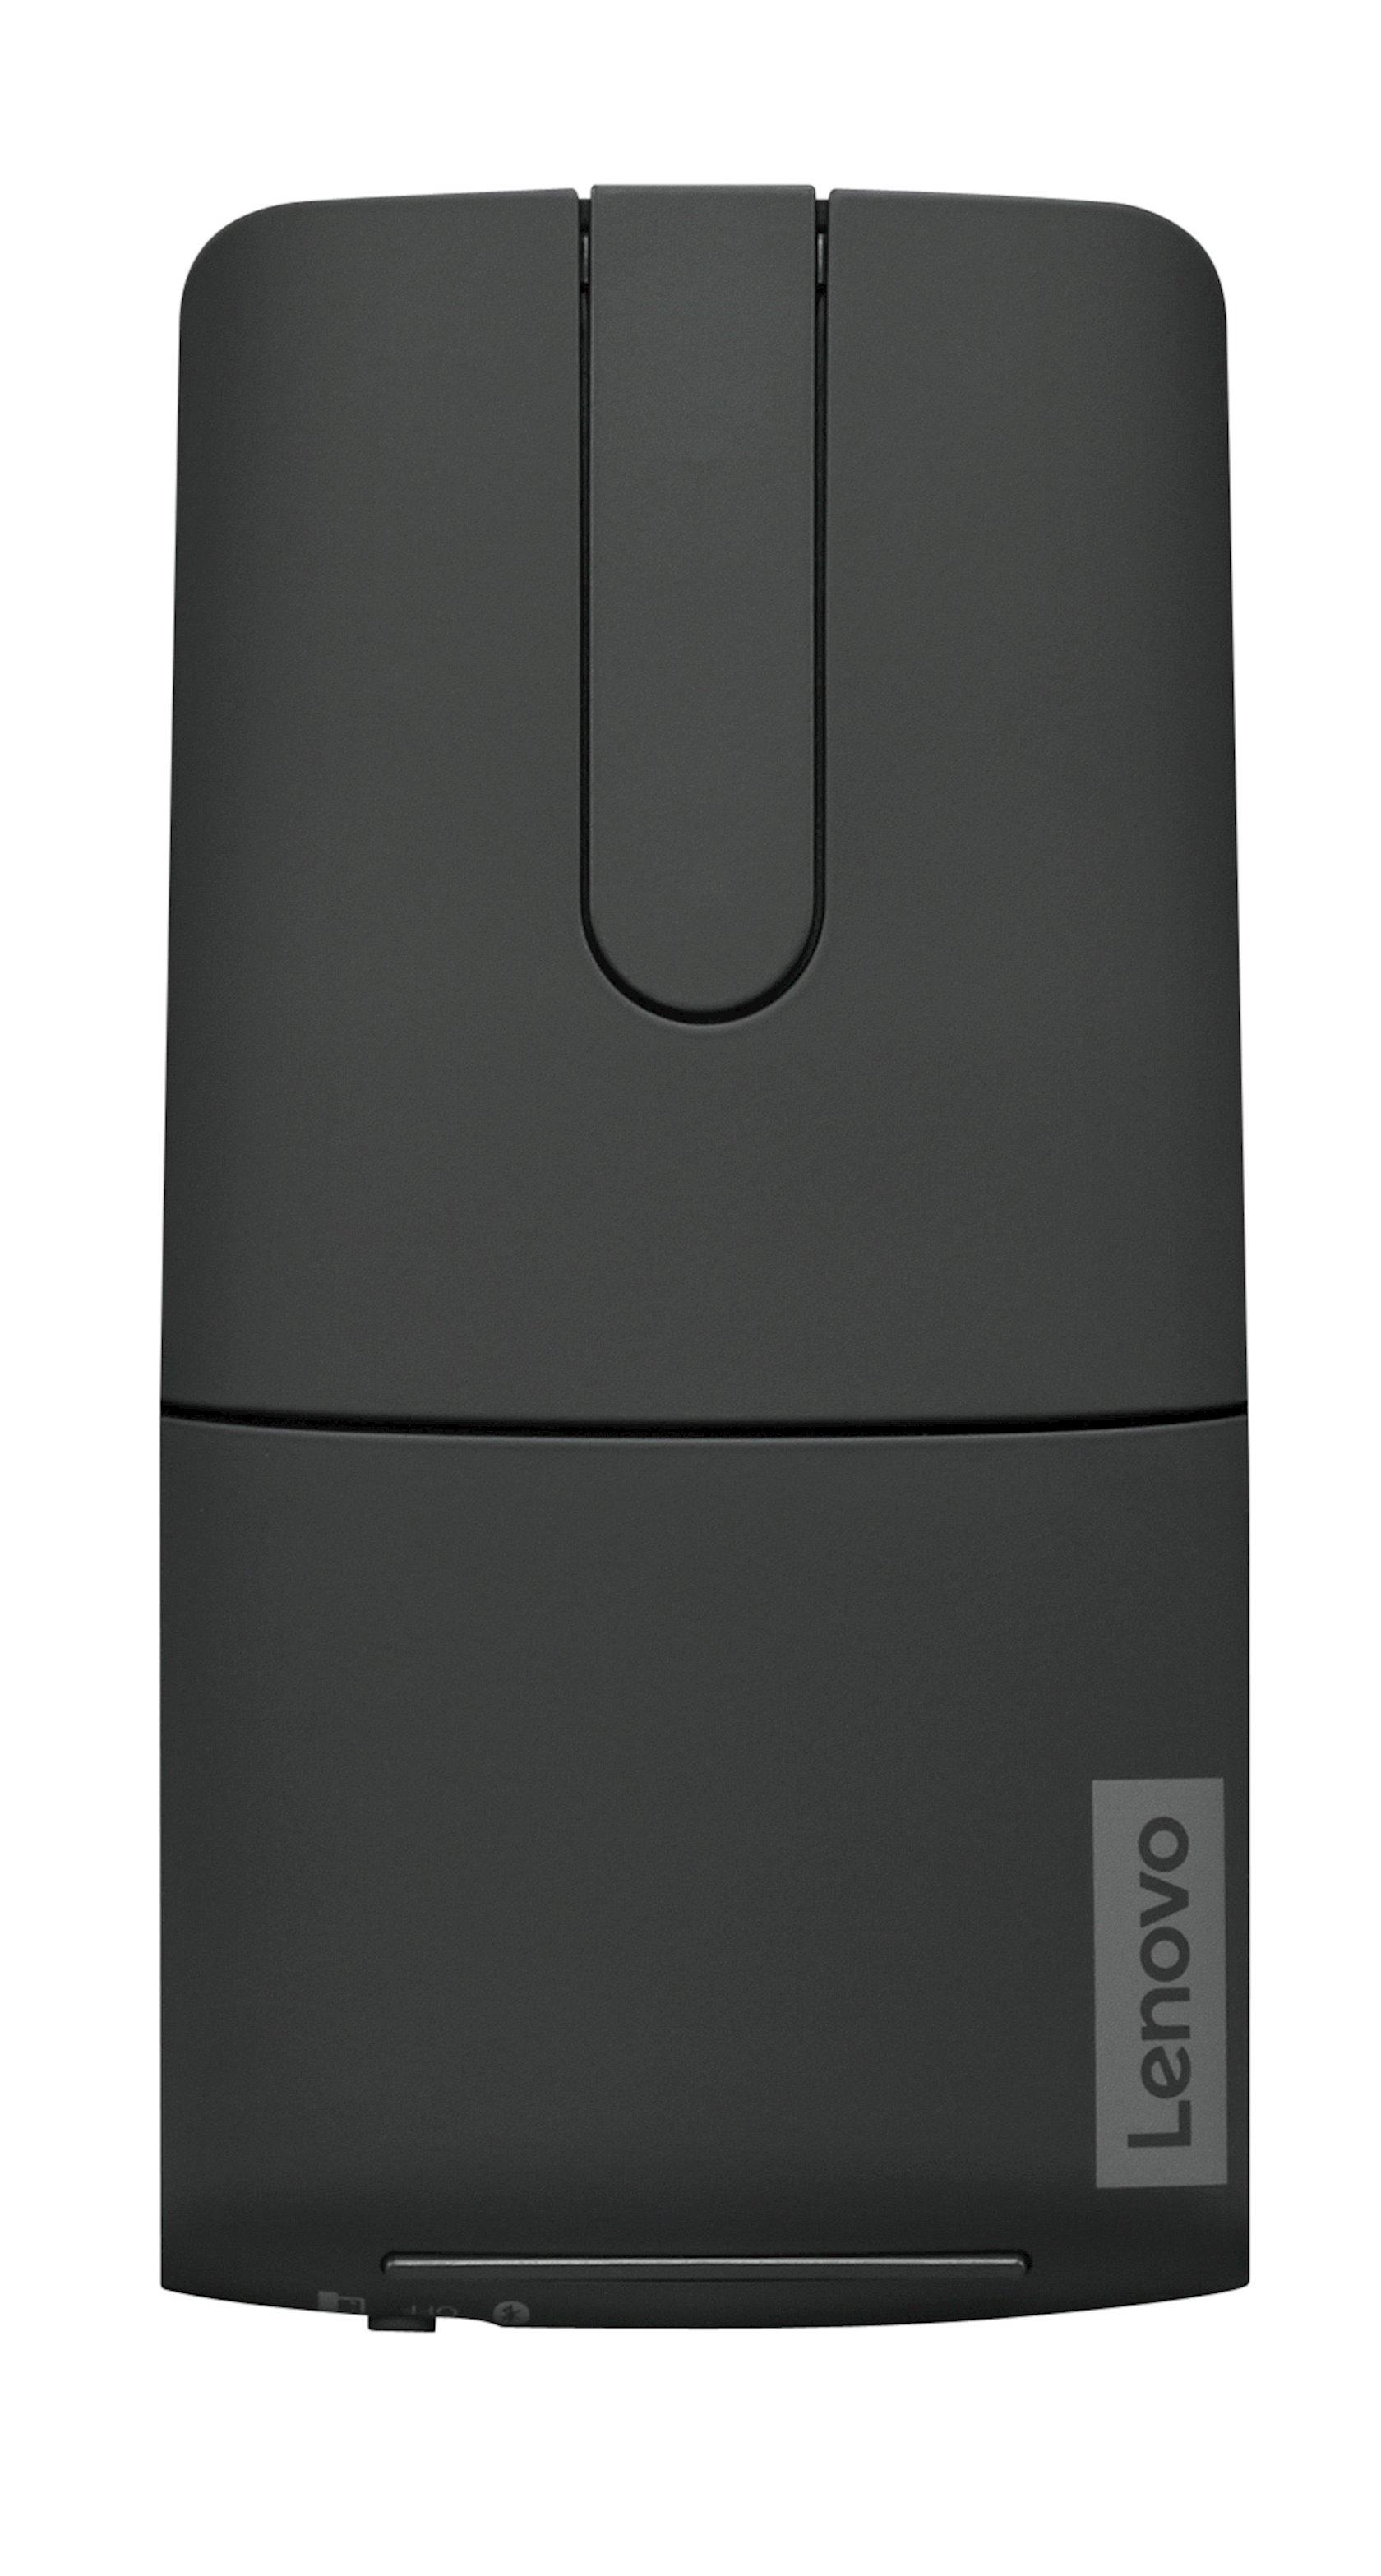 Kompüter siçanı Lenovo ThinkPad X1 Presenter Mouse